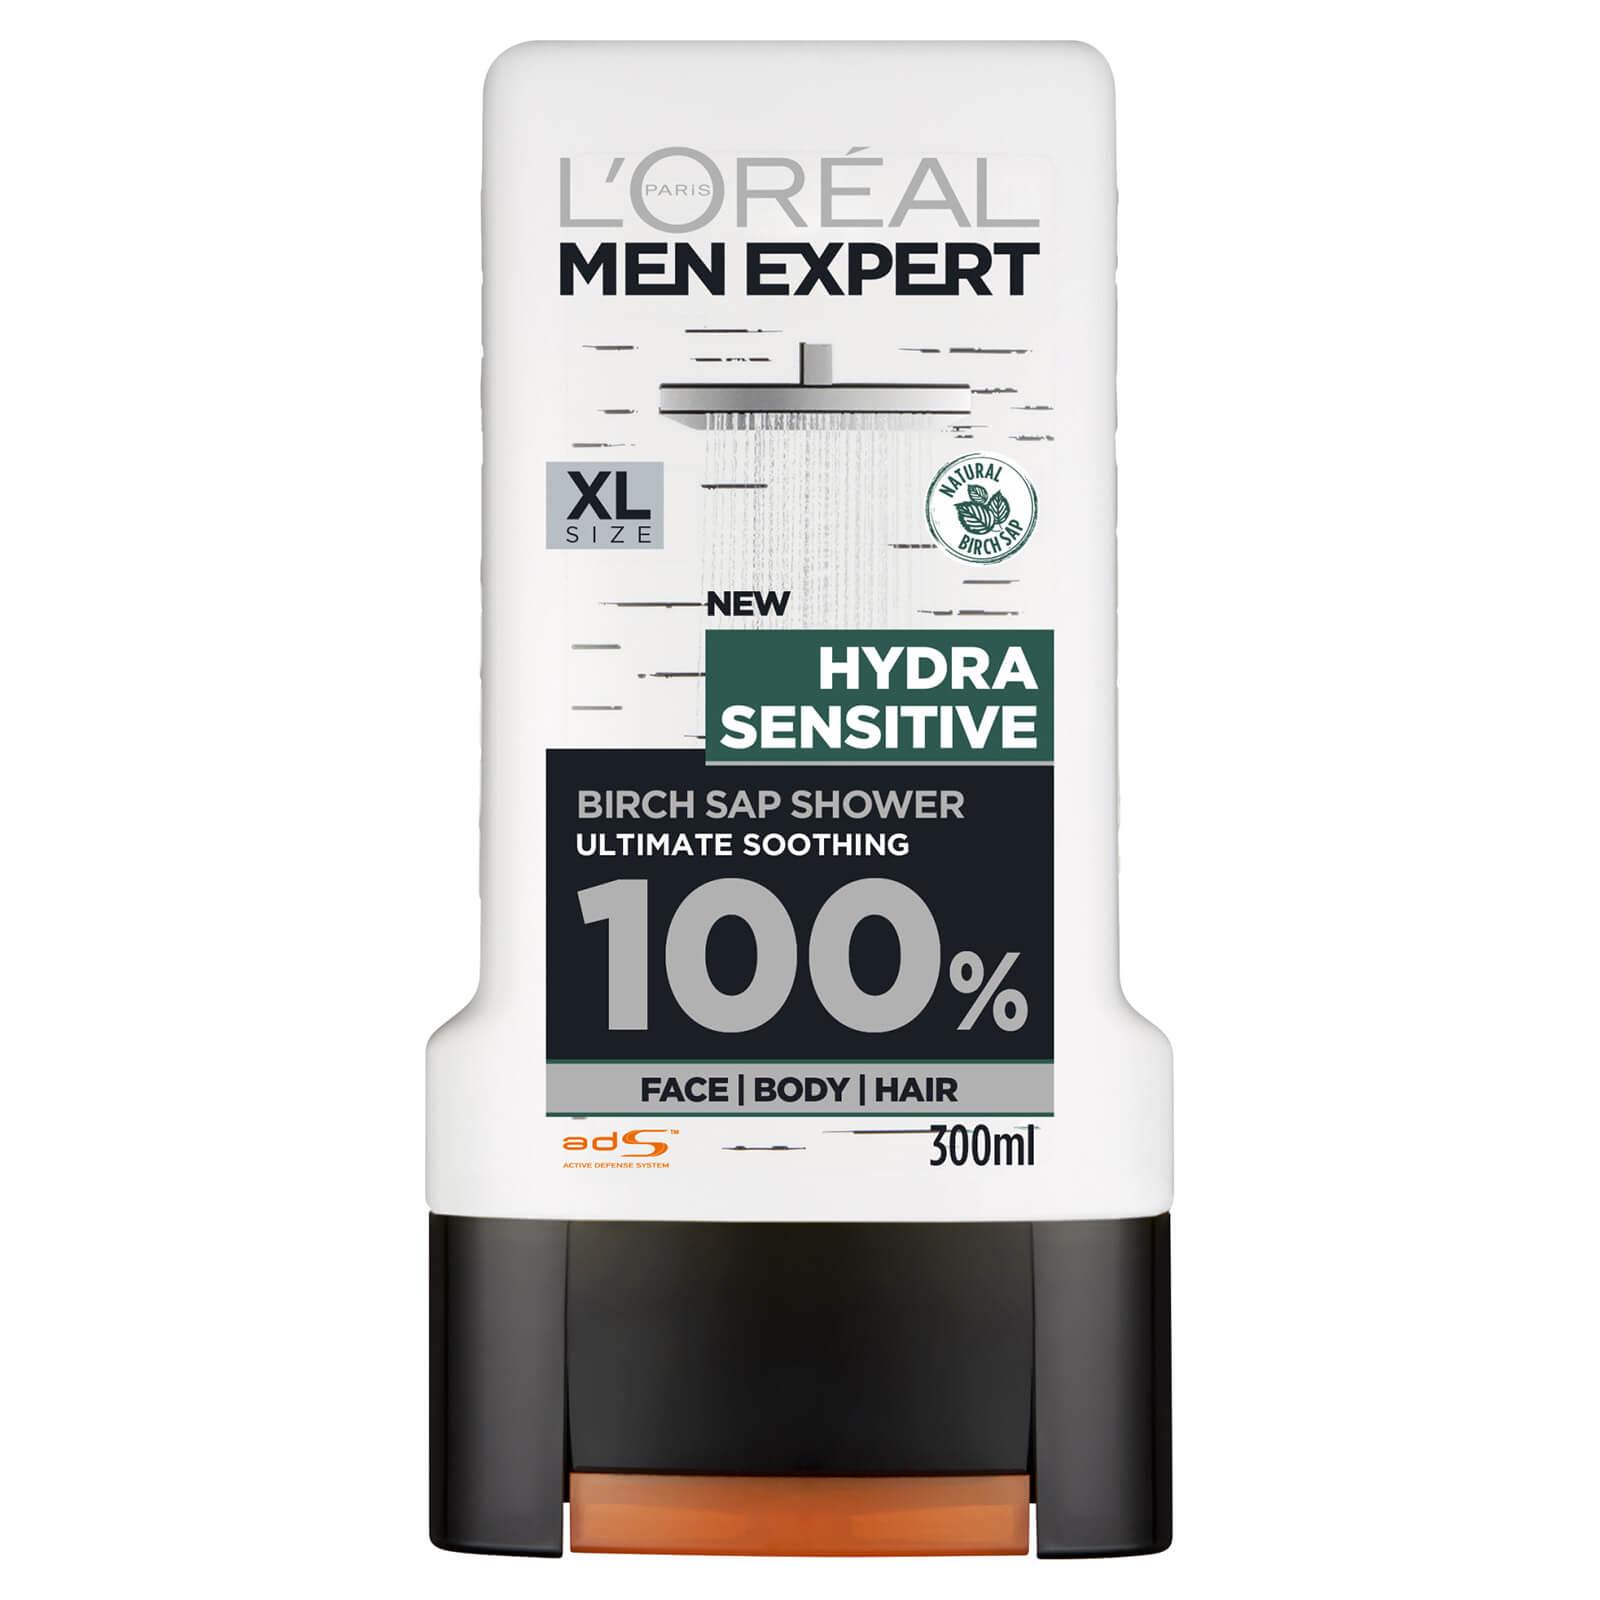 Купить L'Oreal Men Expert Hydra Sensitive 3-in-1 Shower Gel 300ml